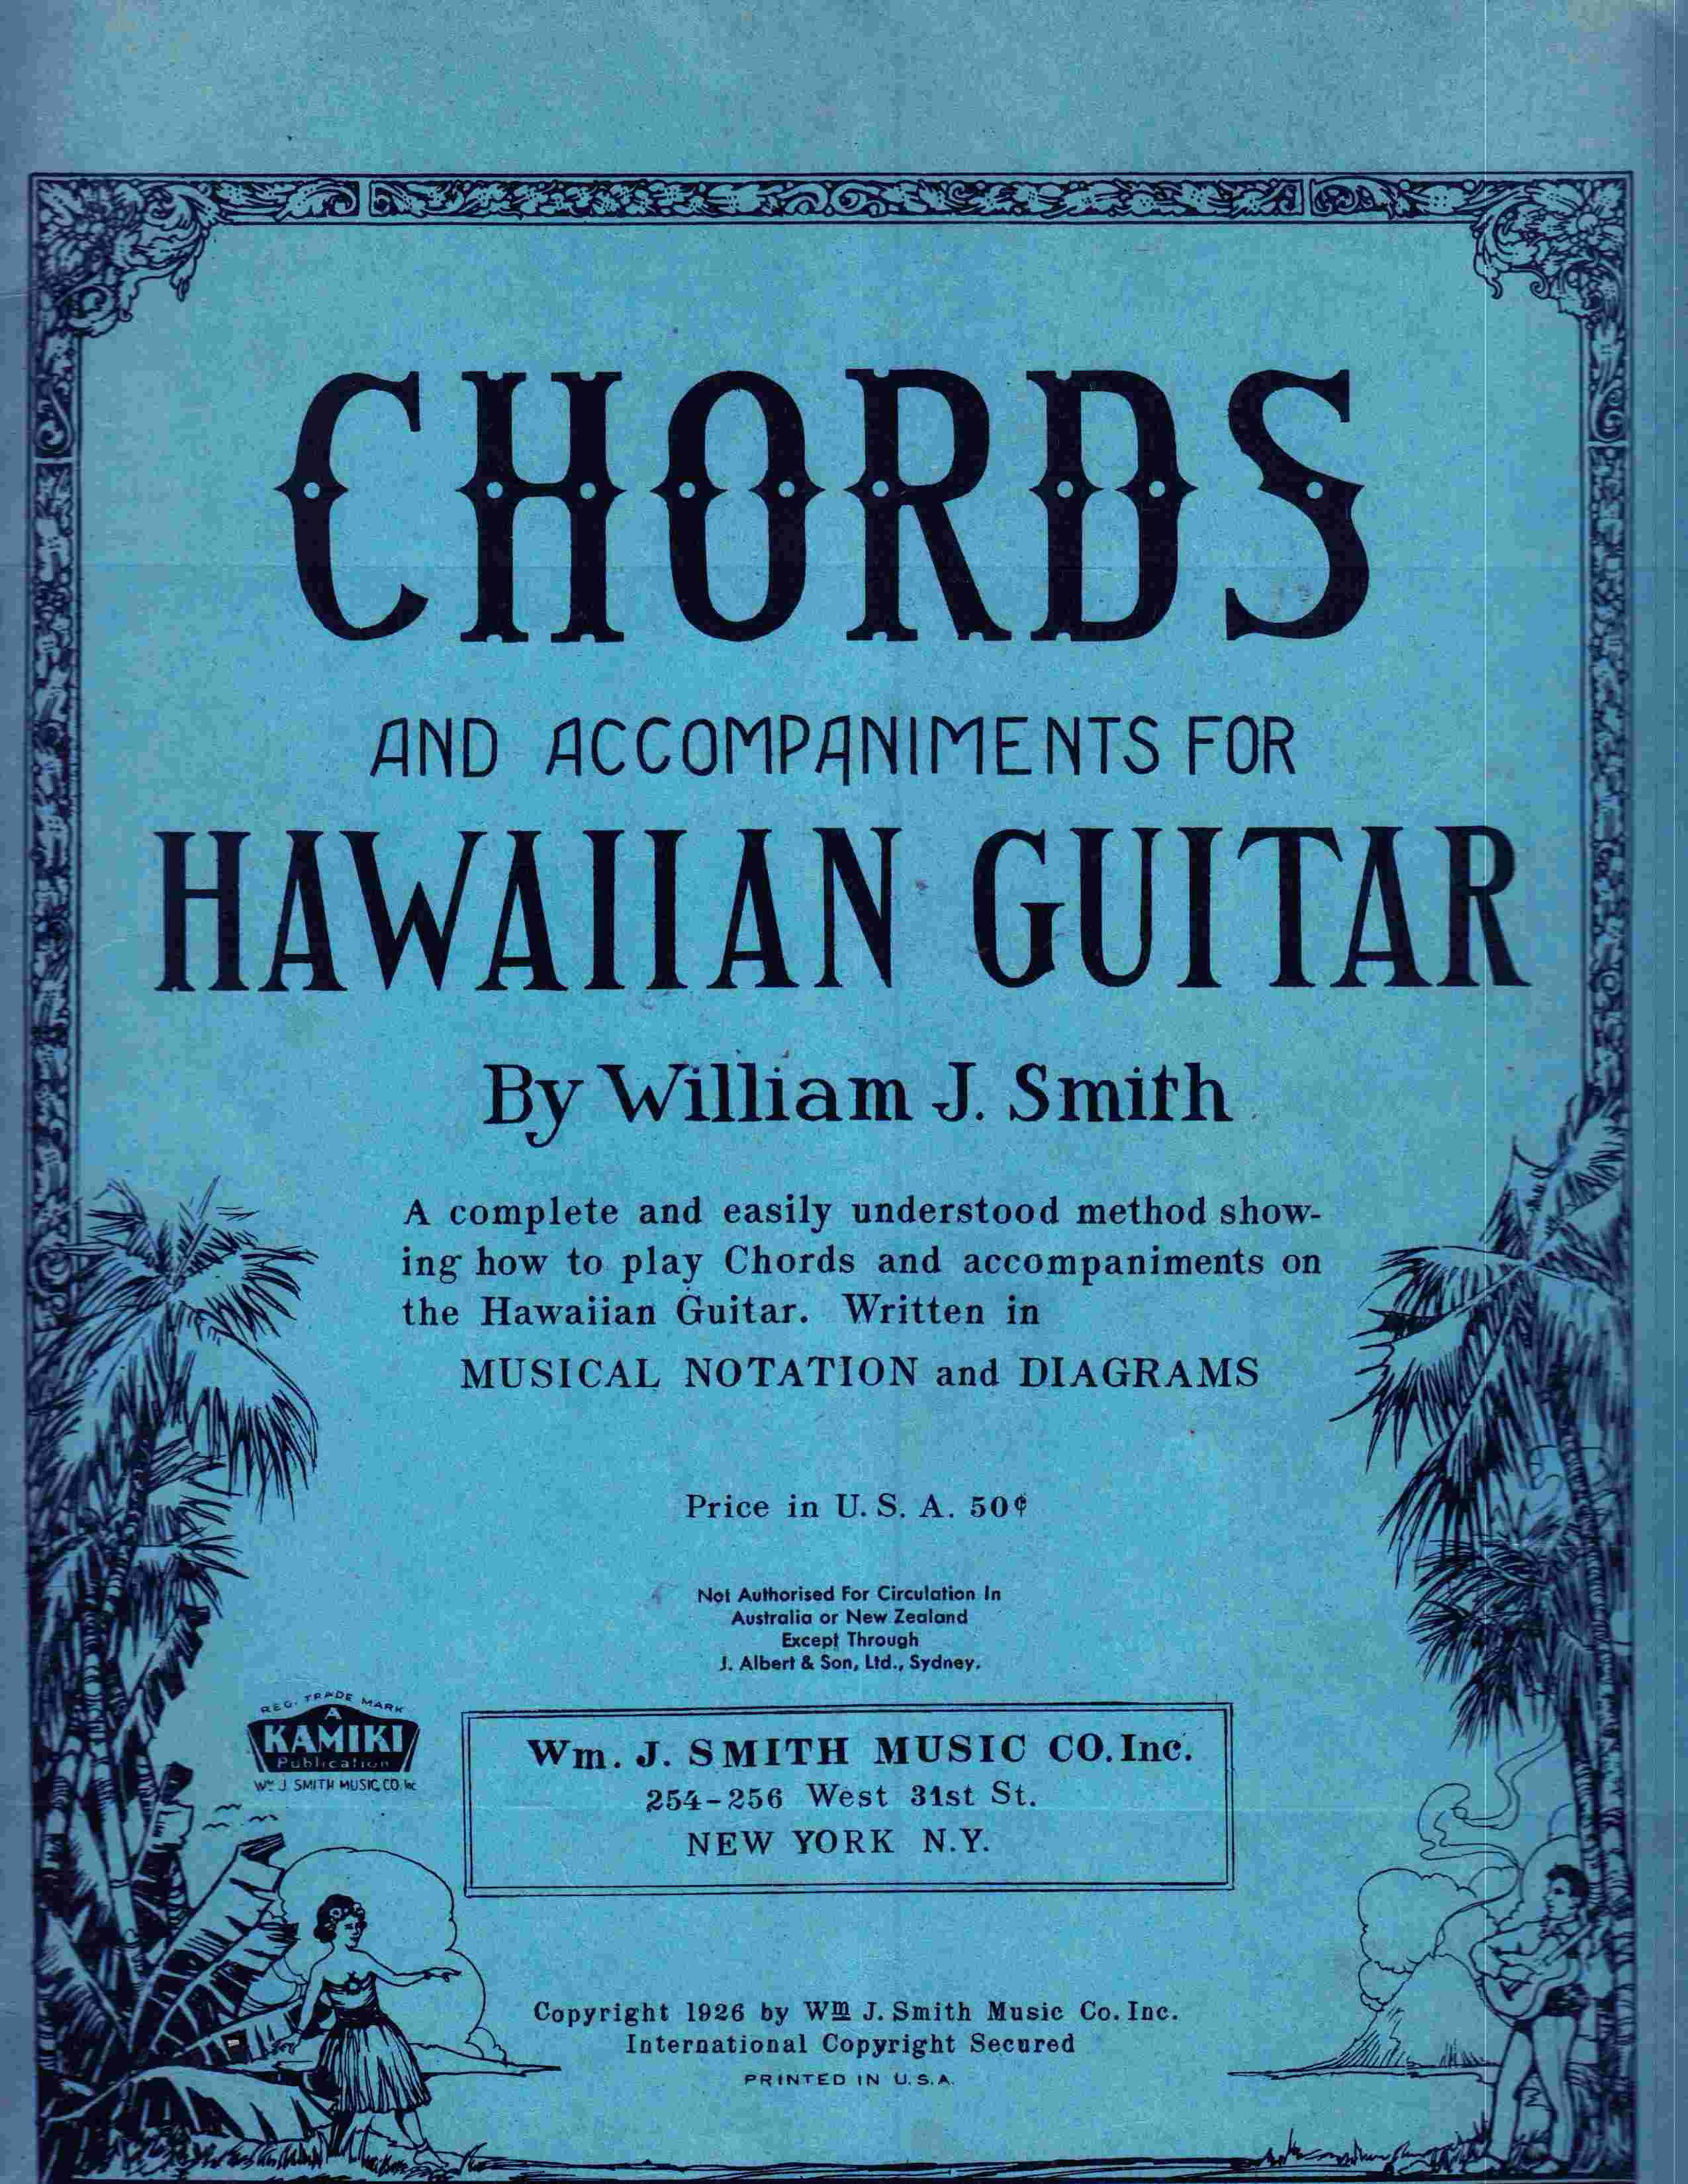 Chords And Accompaniments For Hawaiian Guitar